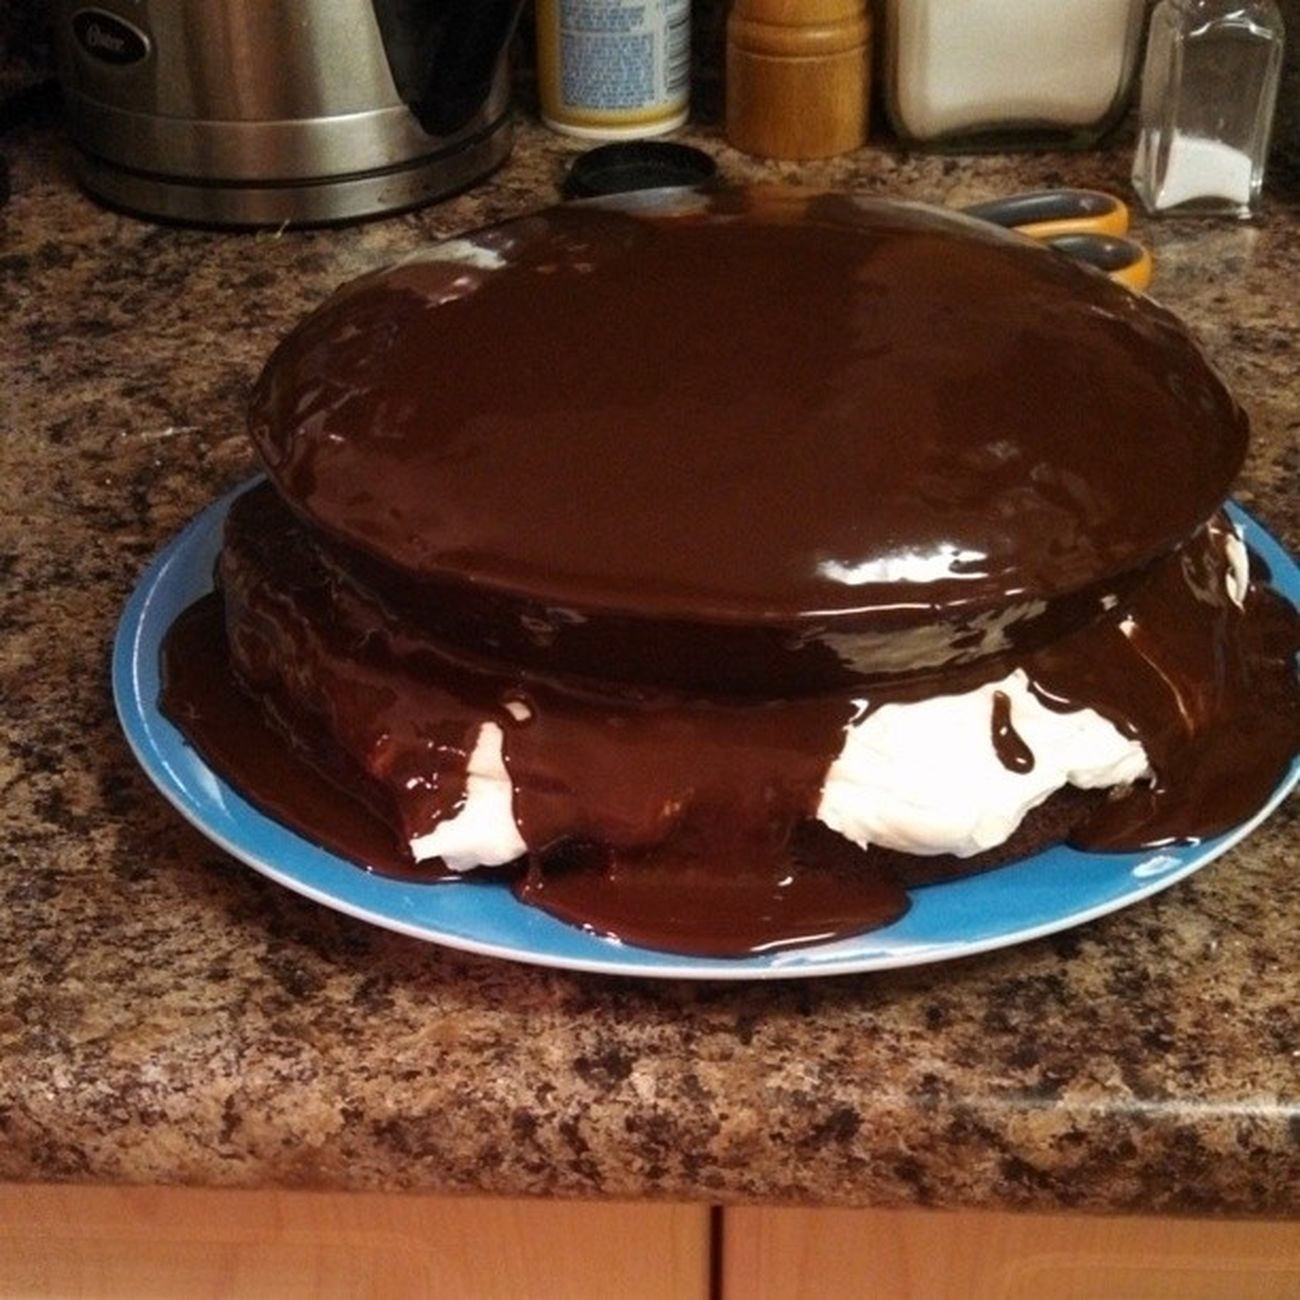 Homemade Whoopiepie Cake smothered in ganache! Happybirthdaybooski